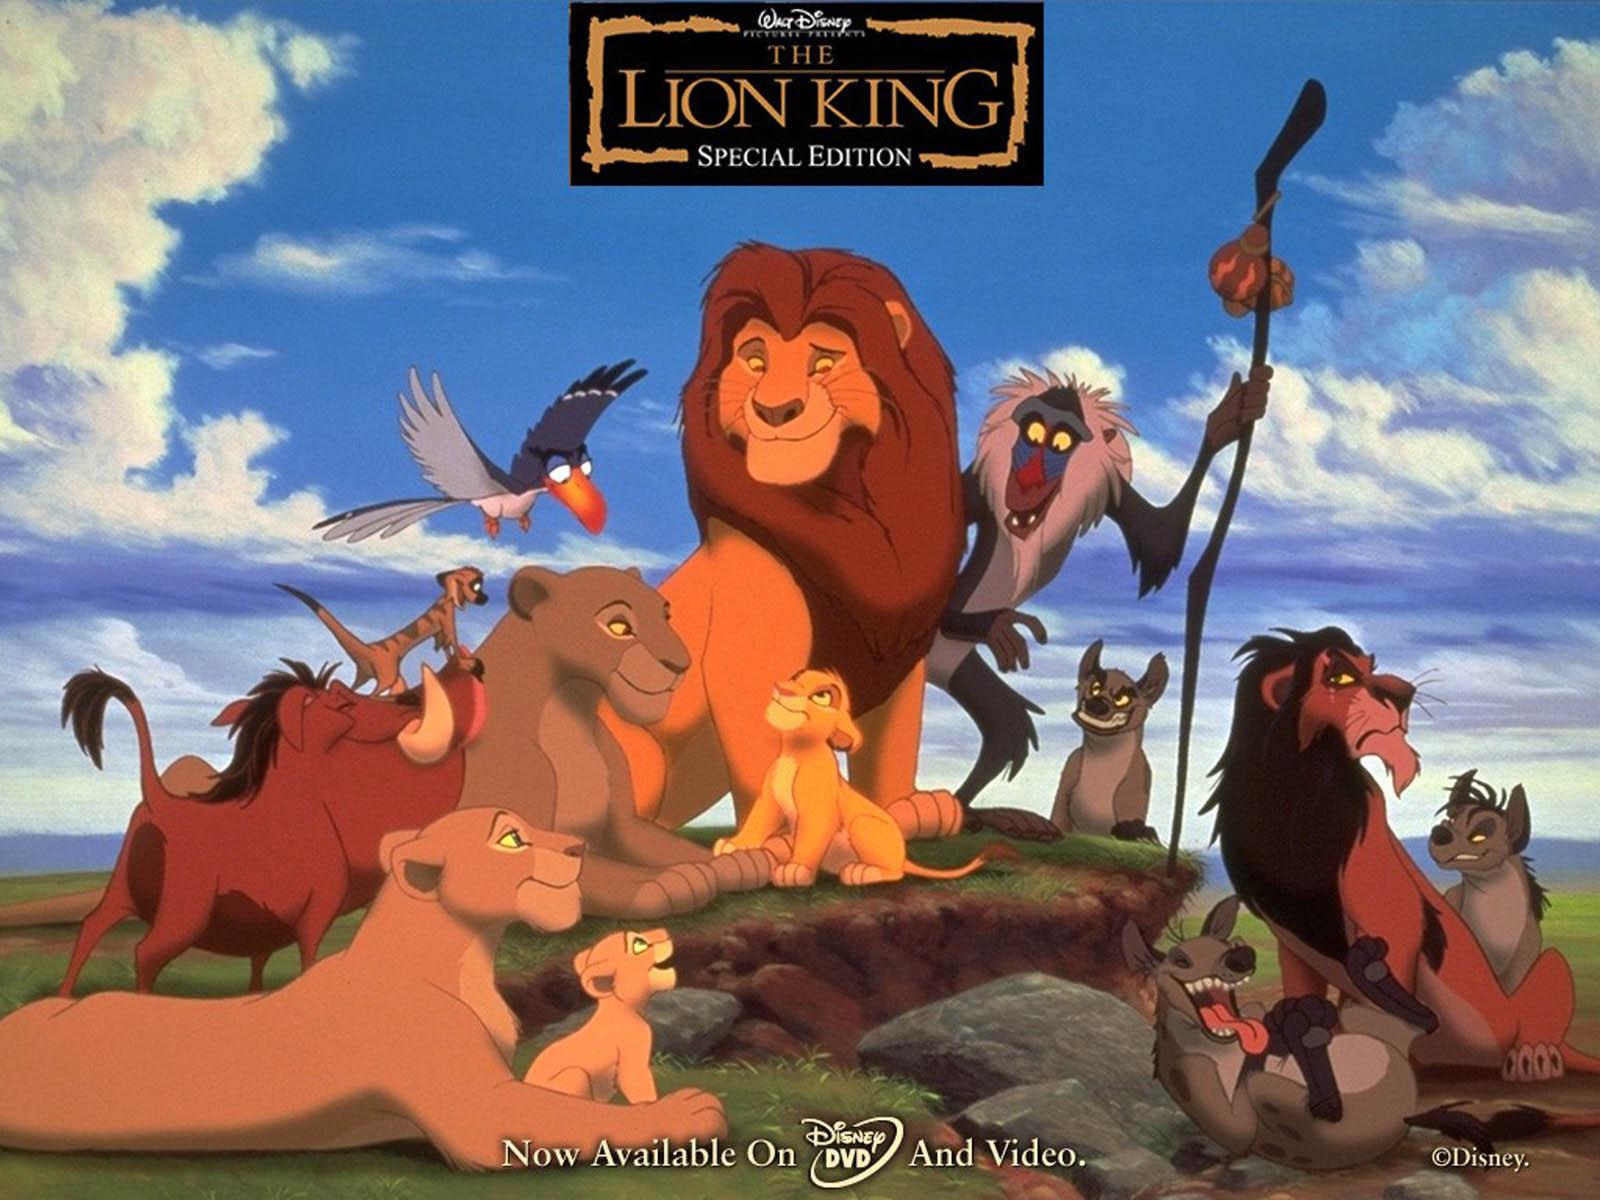 Lion King Wallpapers The Lion King Desktop Wallpapers The Lion King 1600x1200